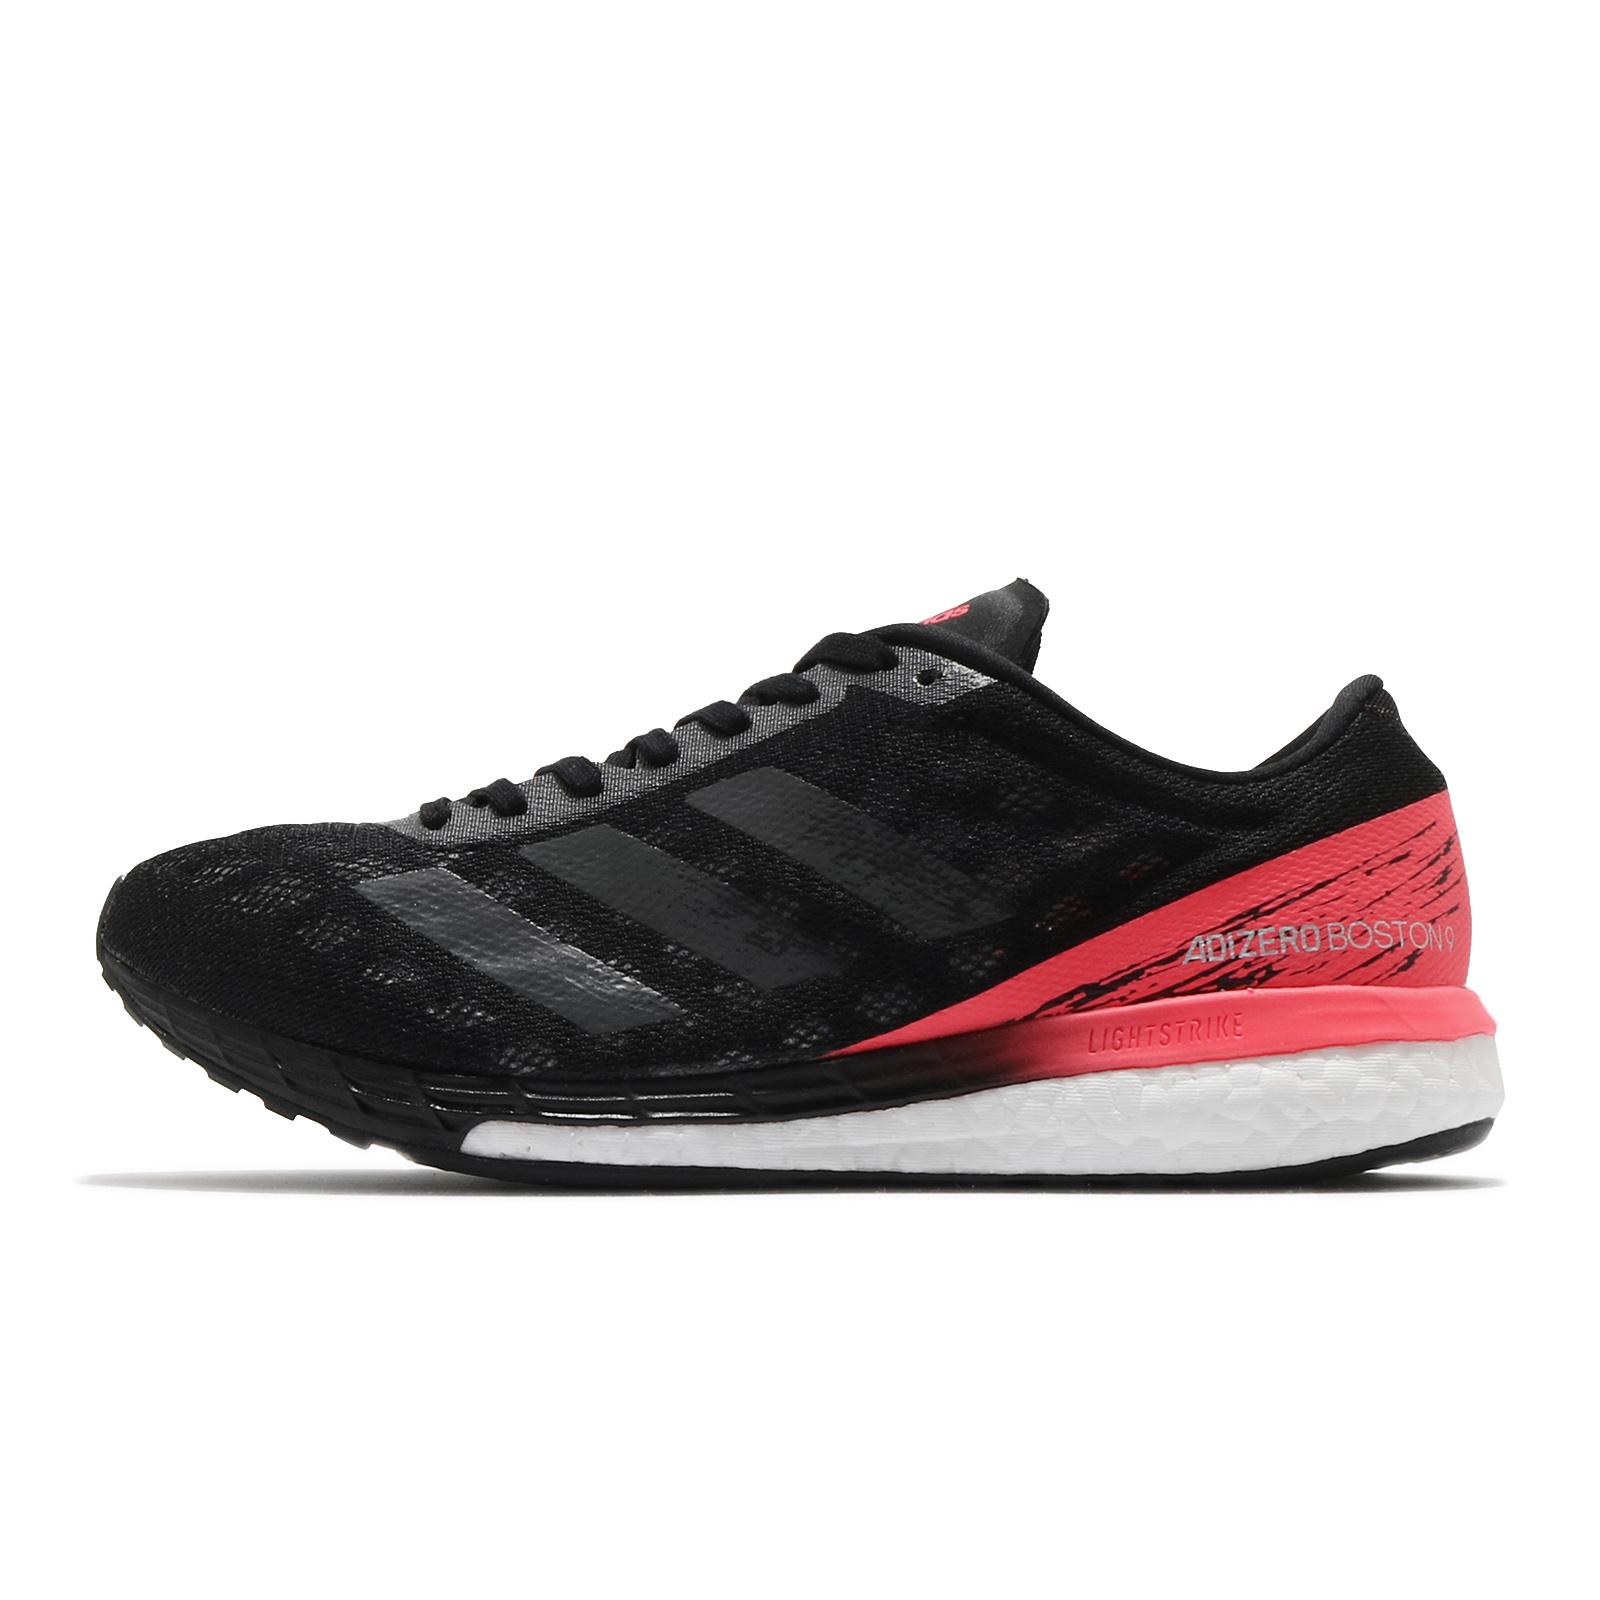 adidas 慢跑鞋 Adizero Boston 9 黑 粉紅 女鞋 愛迪達 Boost 【ACS】 EG4656